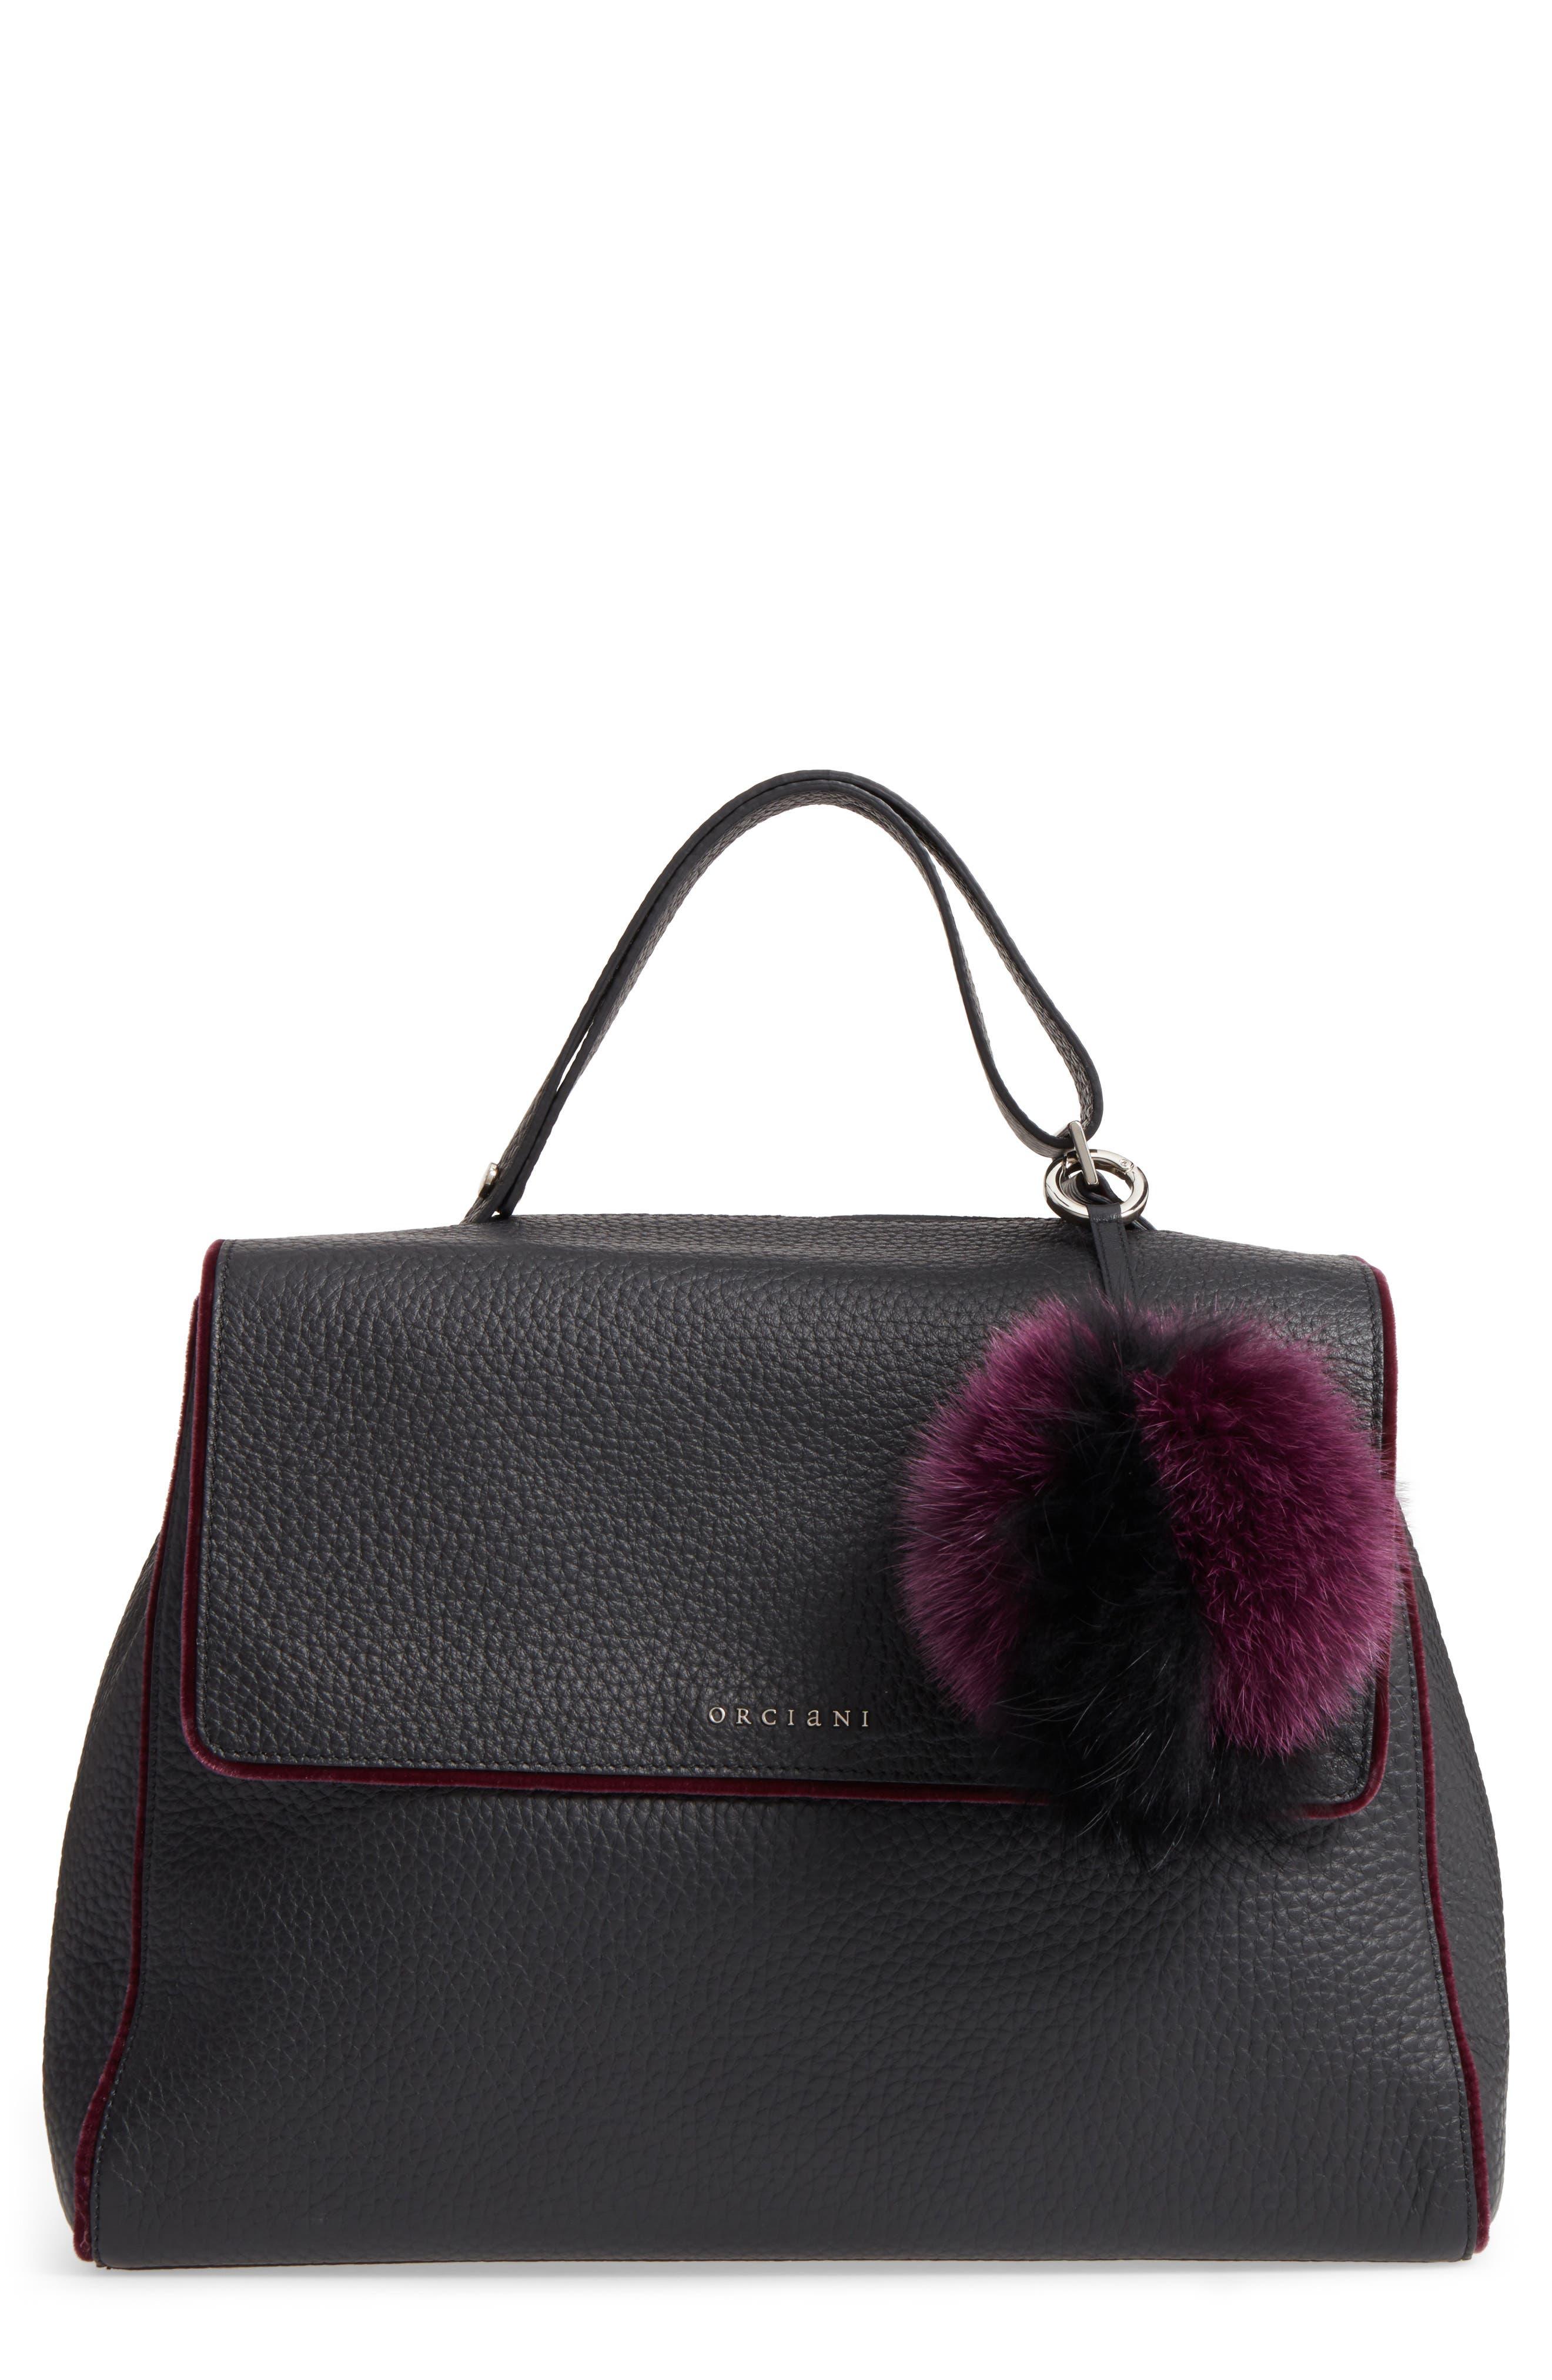 Alternate Image 1 Selected - Orciani Large Sveva Soft Leather Top Handle Satchel with Genuine Fur Bag Charm